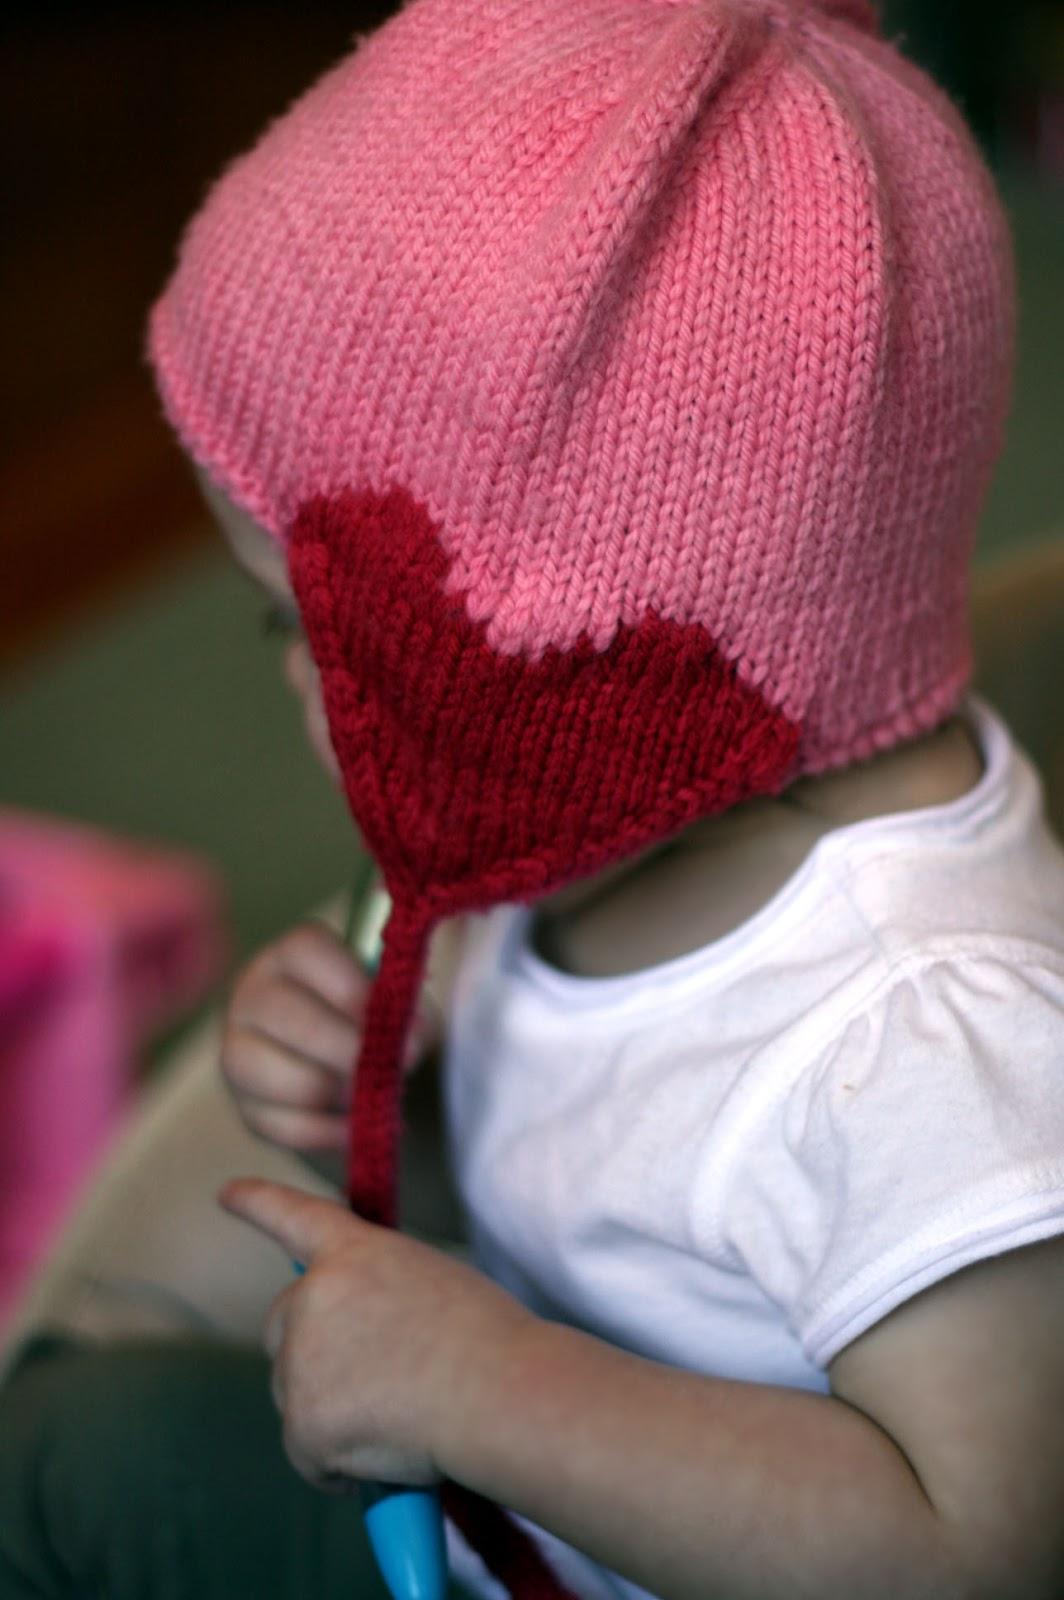 Knit Hat Pattern With Heart : http://3.bp.blogspot.com/-TfySIM4MS9I/TzUVaKIrDxI ...